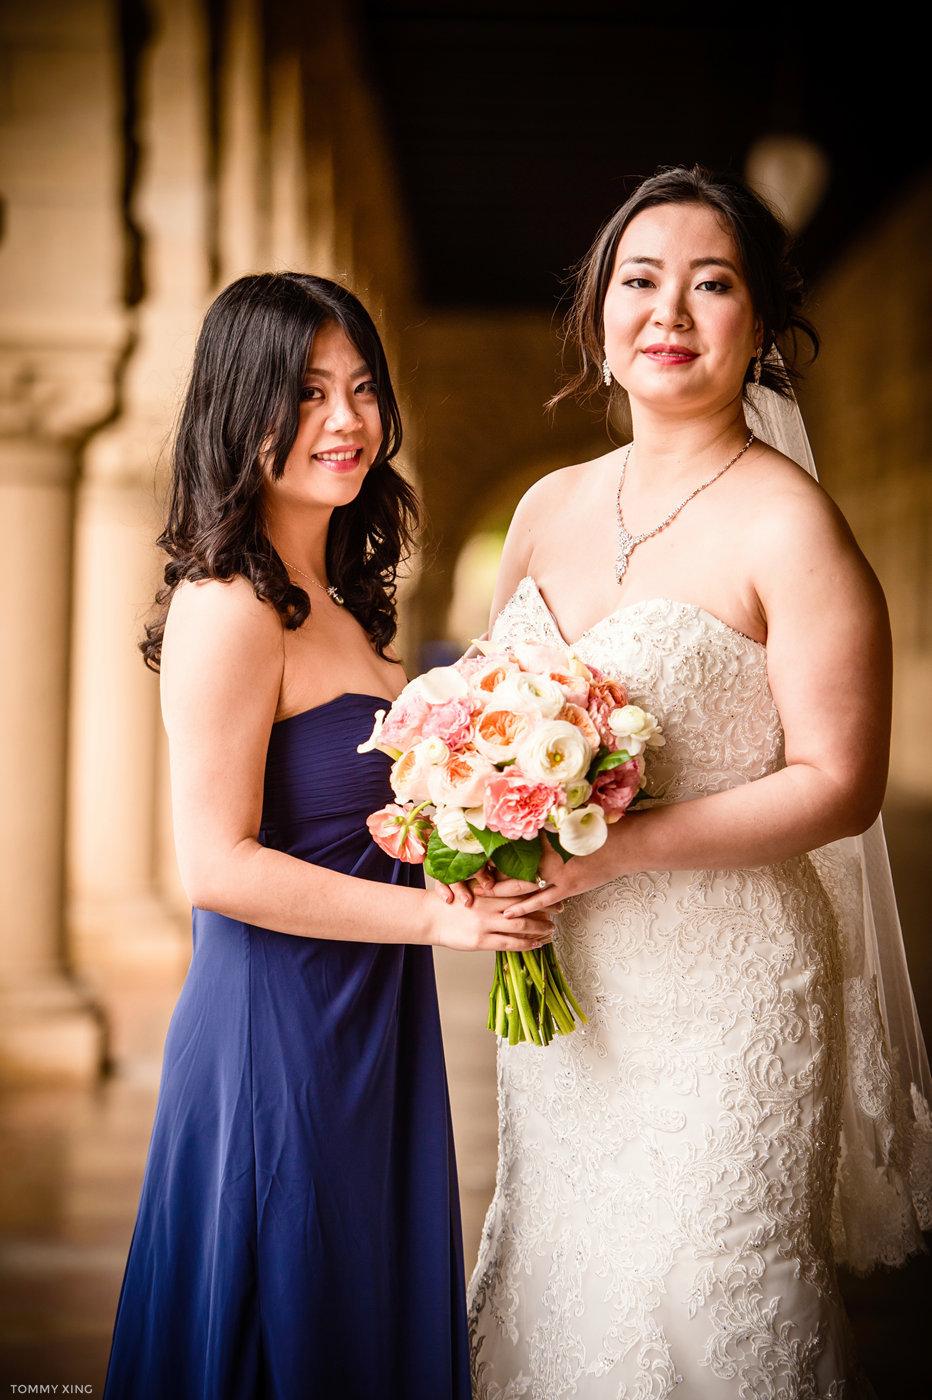 STANFORD MEMORIAL CHURCH WEDDING - Wenjie & Chengcheng - SAN FRANCISCO BAY AREA 斯坦福教堂婚礼跟拍 - 洛杉矶婚礼婚纱照摄影师 Tommy Xing Photography145.jpg